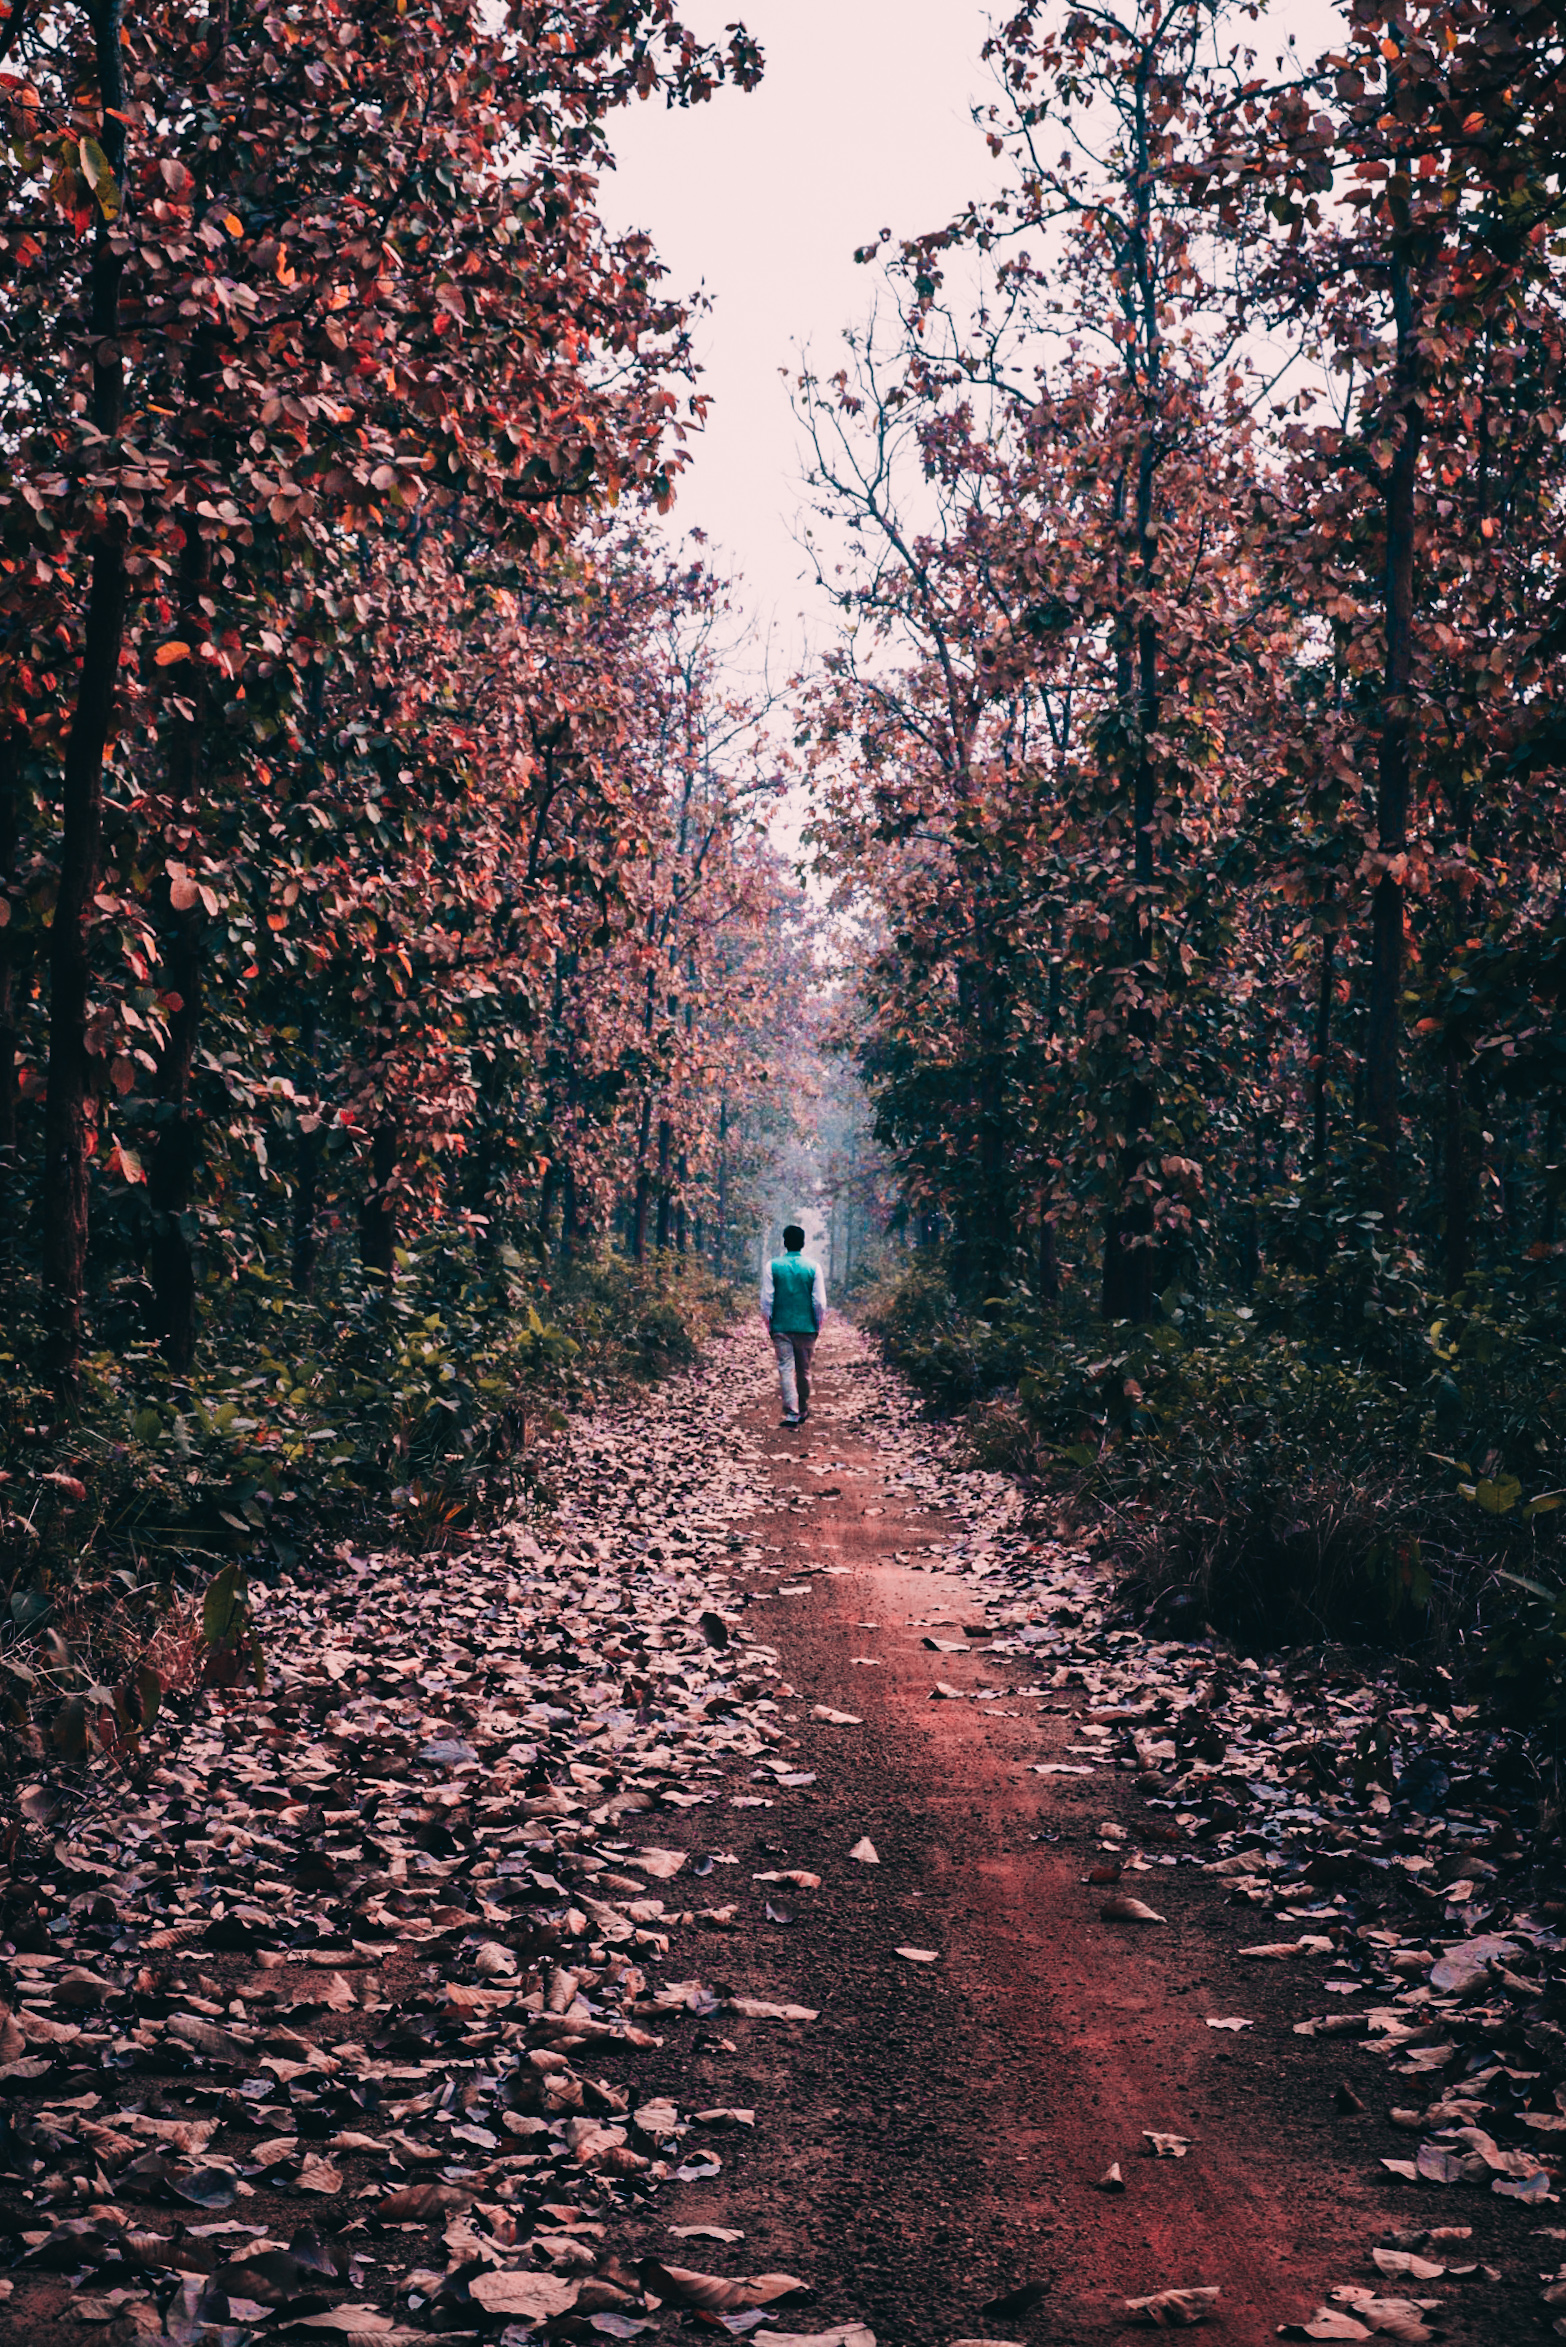 A walkway in a jungle